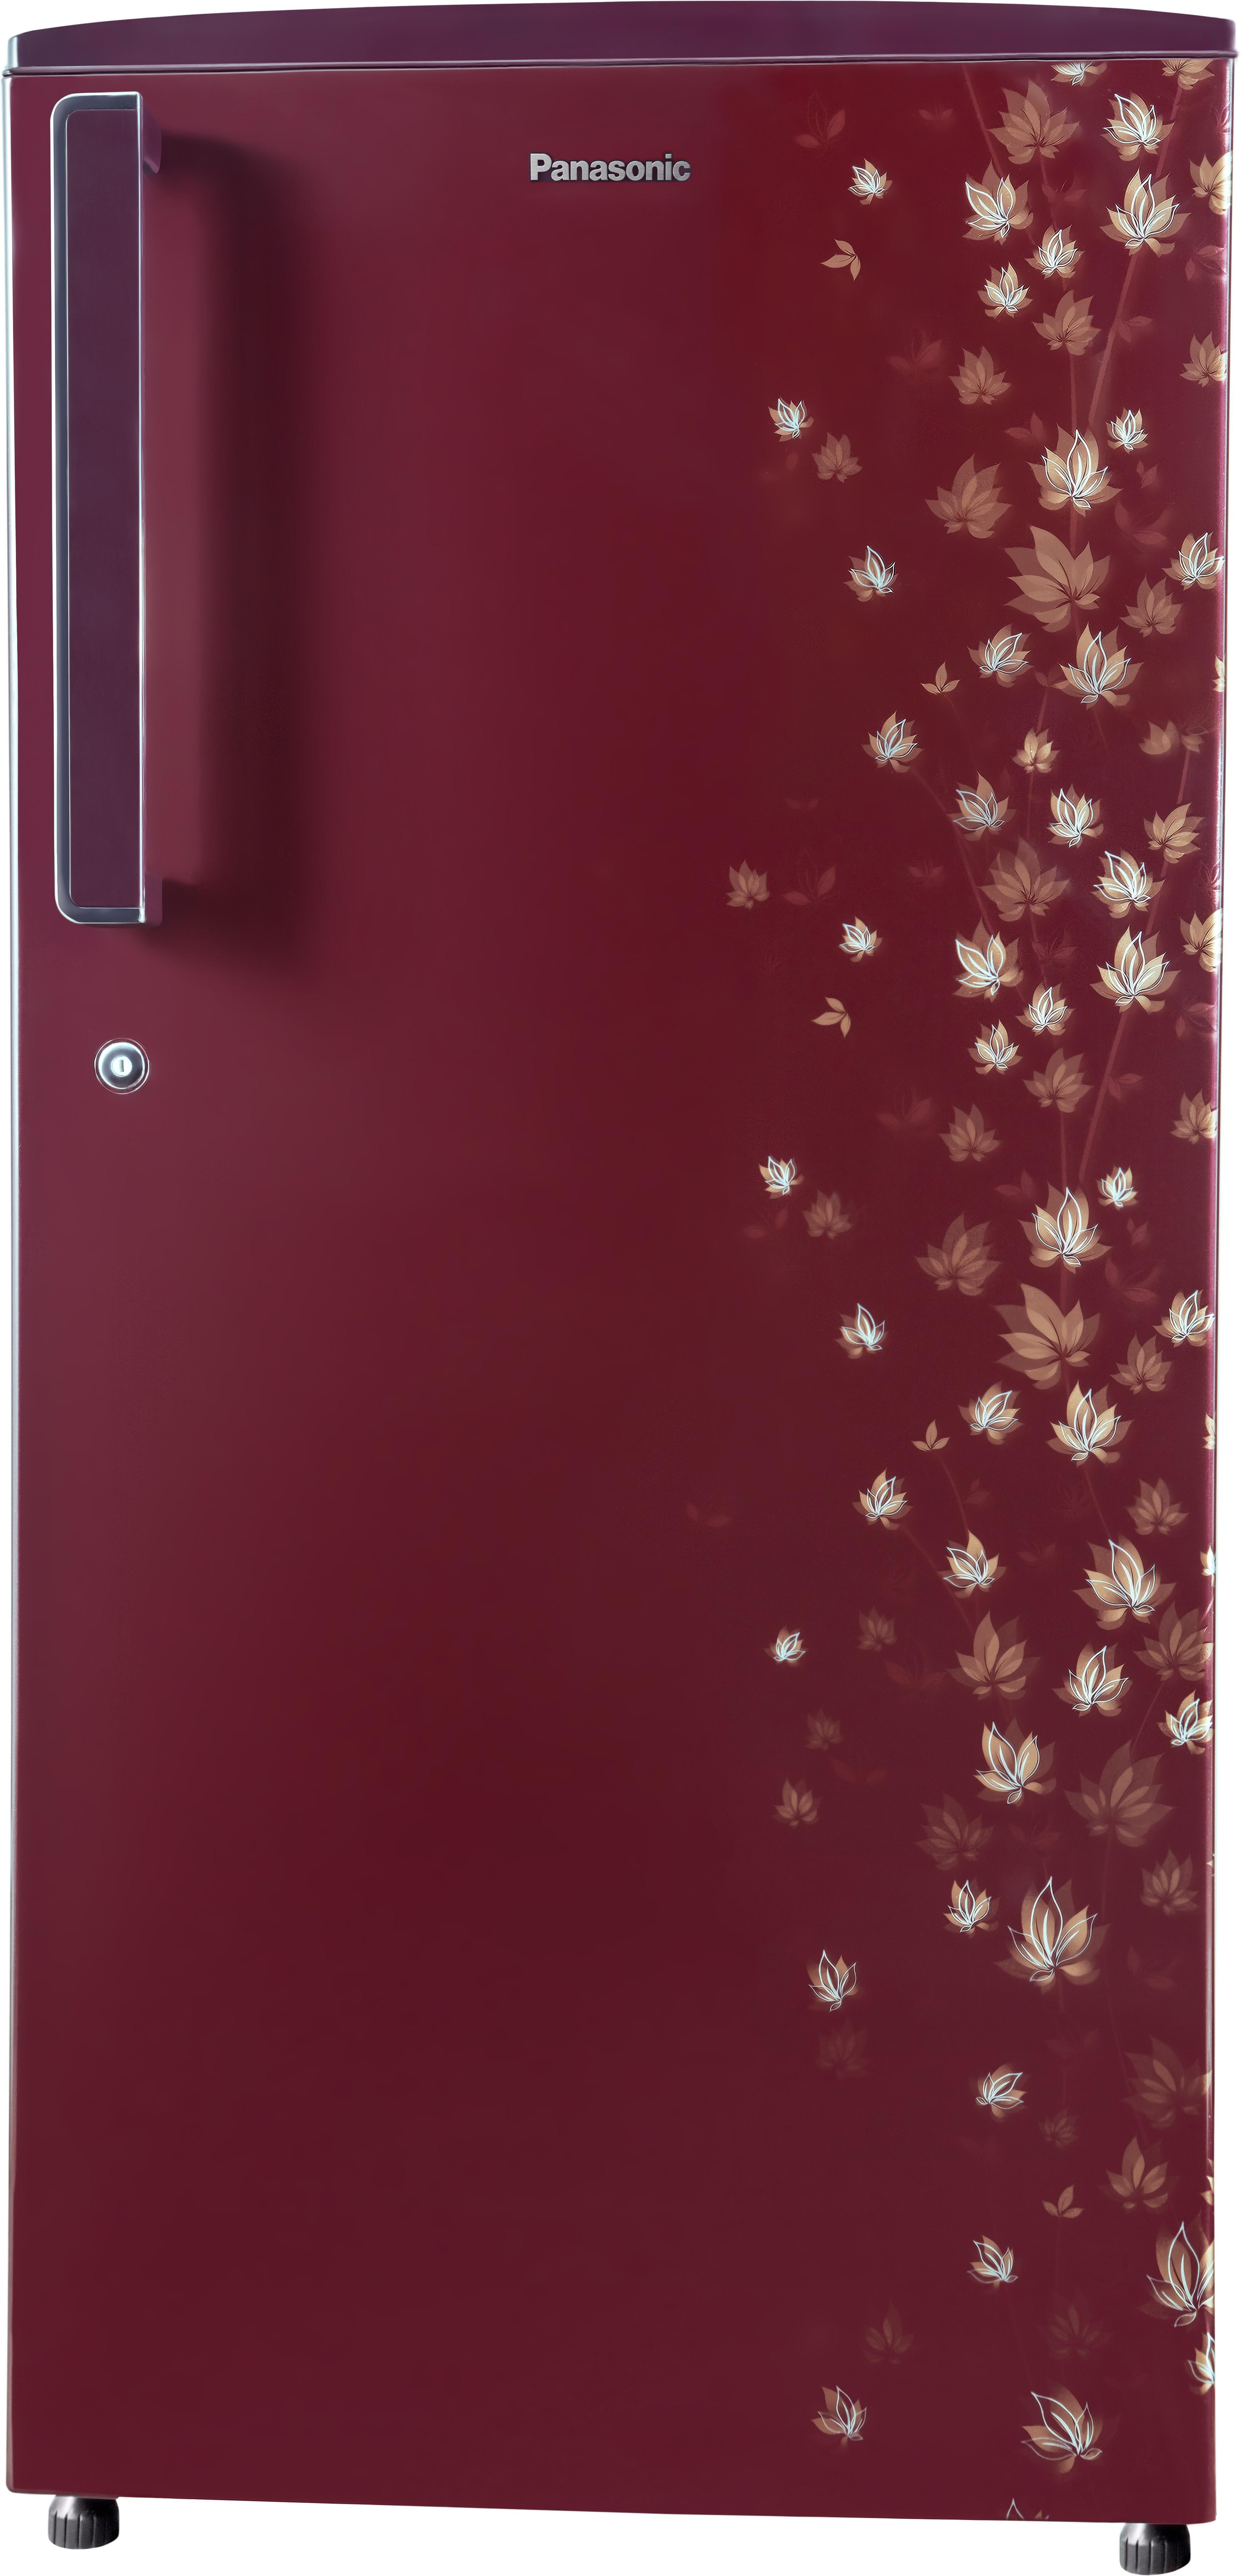 84074029275 PANASONIC NR A221STMGP 215Ltr Single Door Refrigerator Price in India 03  Jun 2019